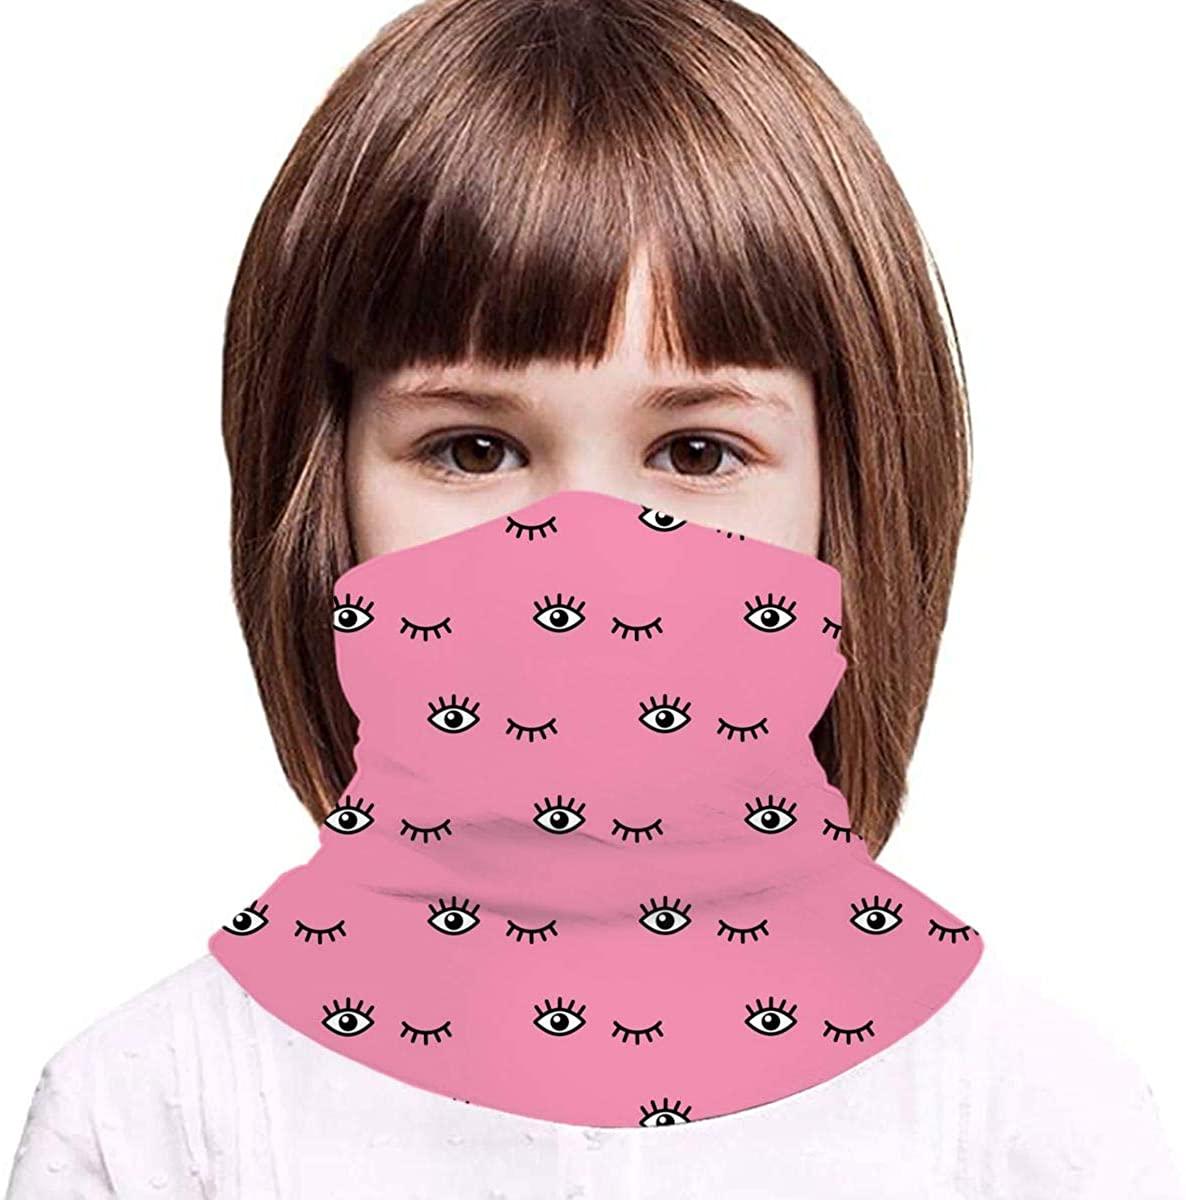 with Cartoon Eyes On Pink Kids Bandanas Reusable Washable Neck Gaiter Balaclava,Half Face Protective Masks